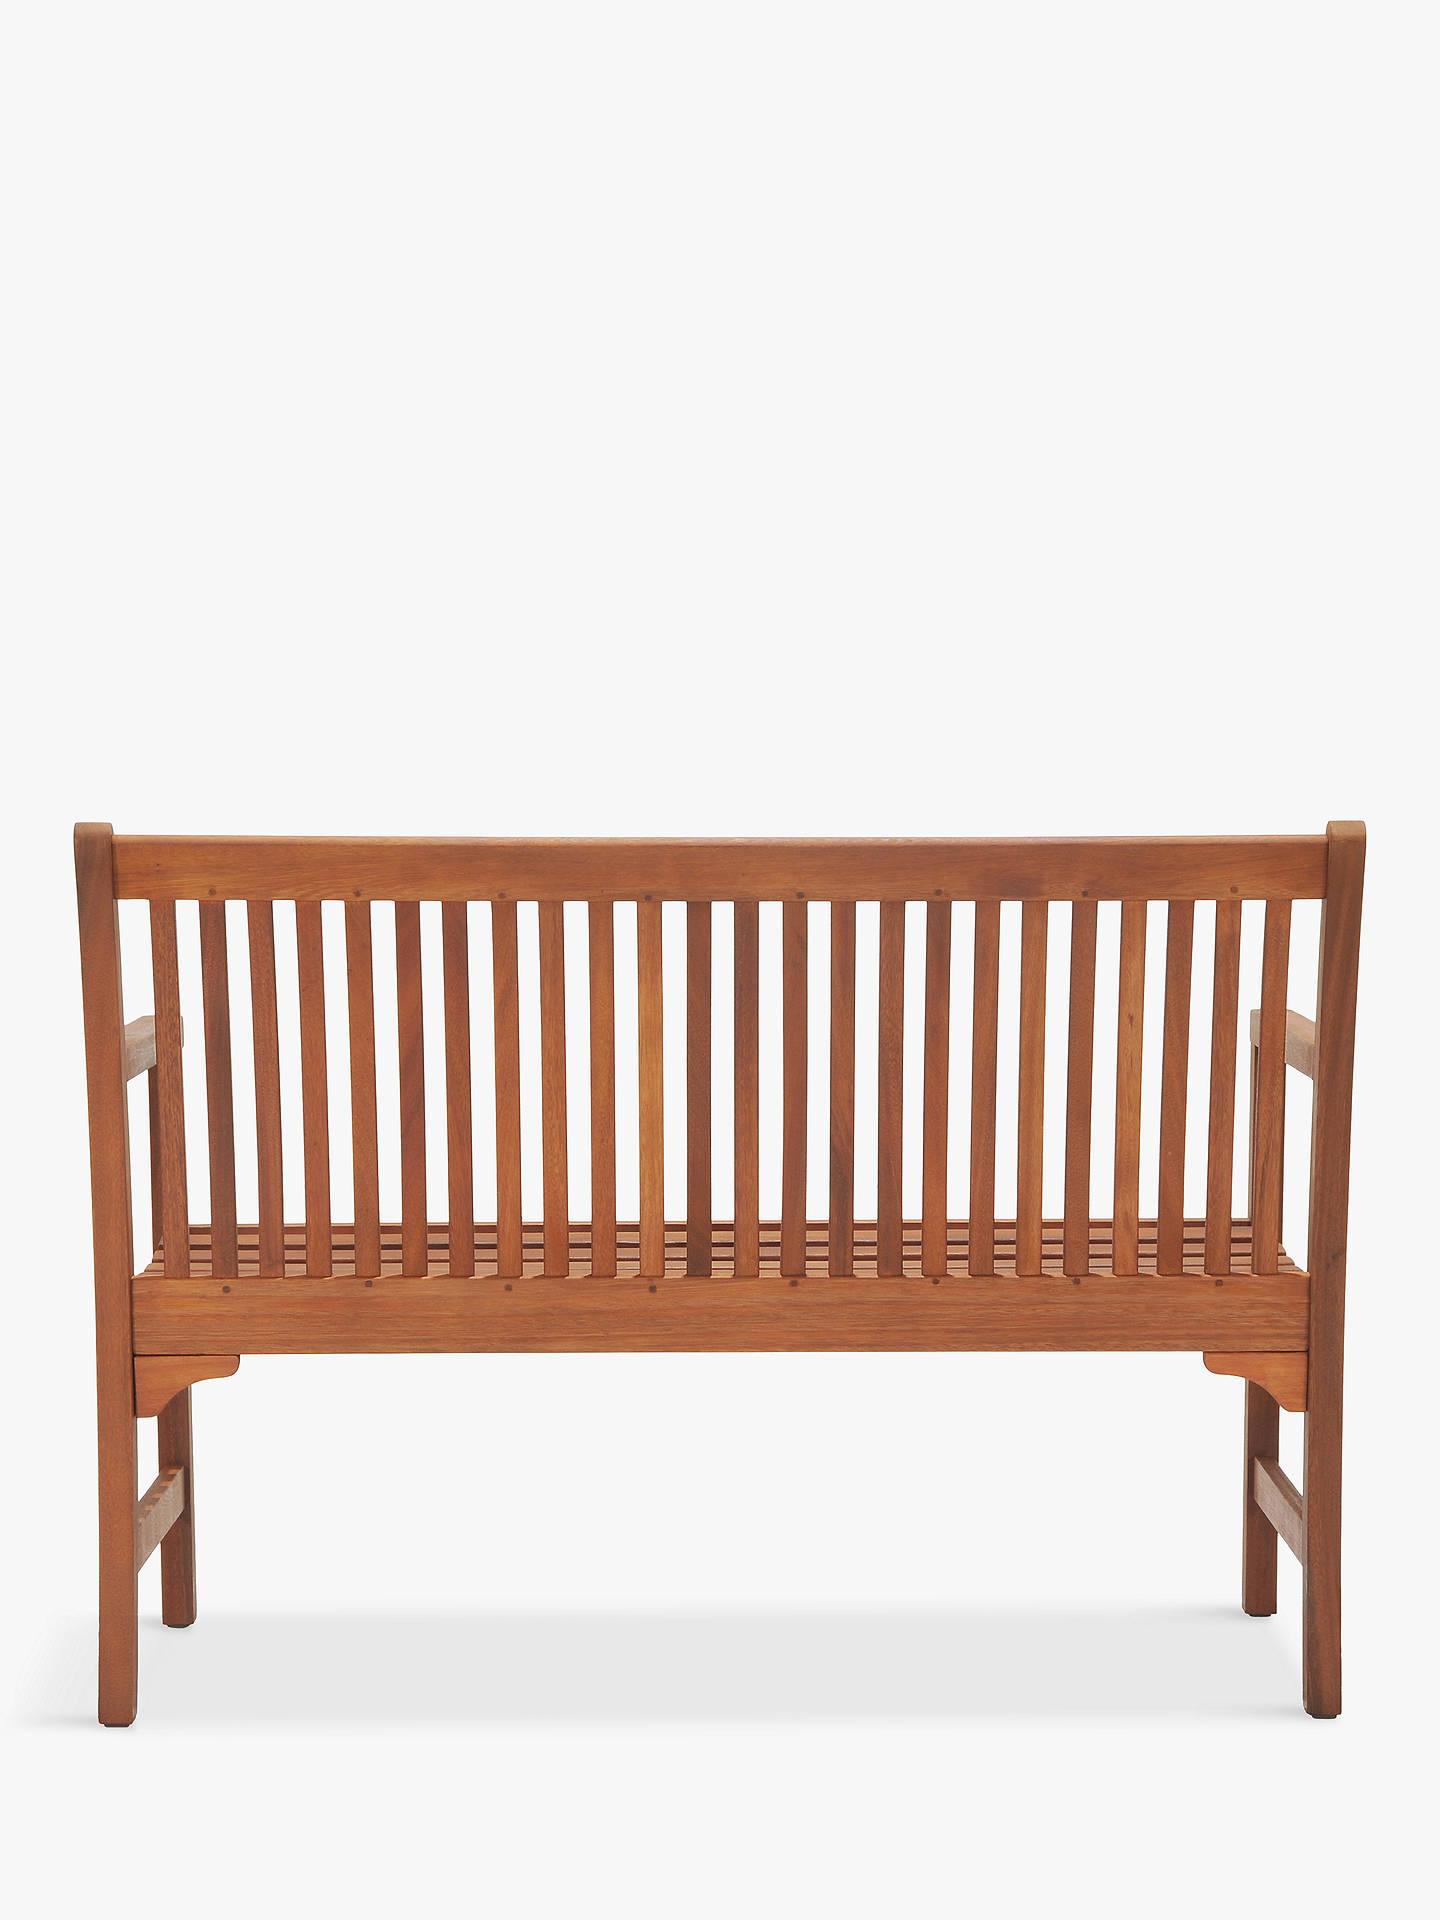 Awe Inspiring John Lewis Partners Venice 2 Seater Bench Fsc Certified Eucalyptus Natural Ibusinesslaw Wood Chair Design Ideas Ibusinesslaworg